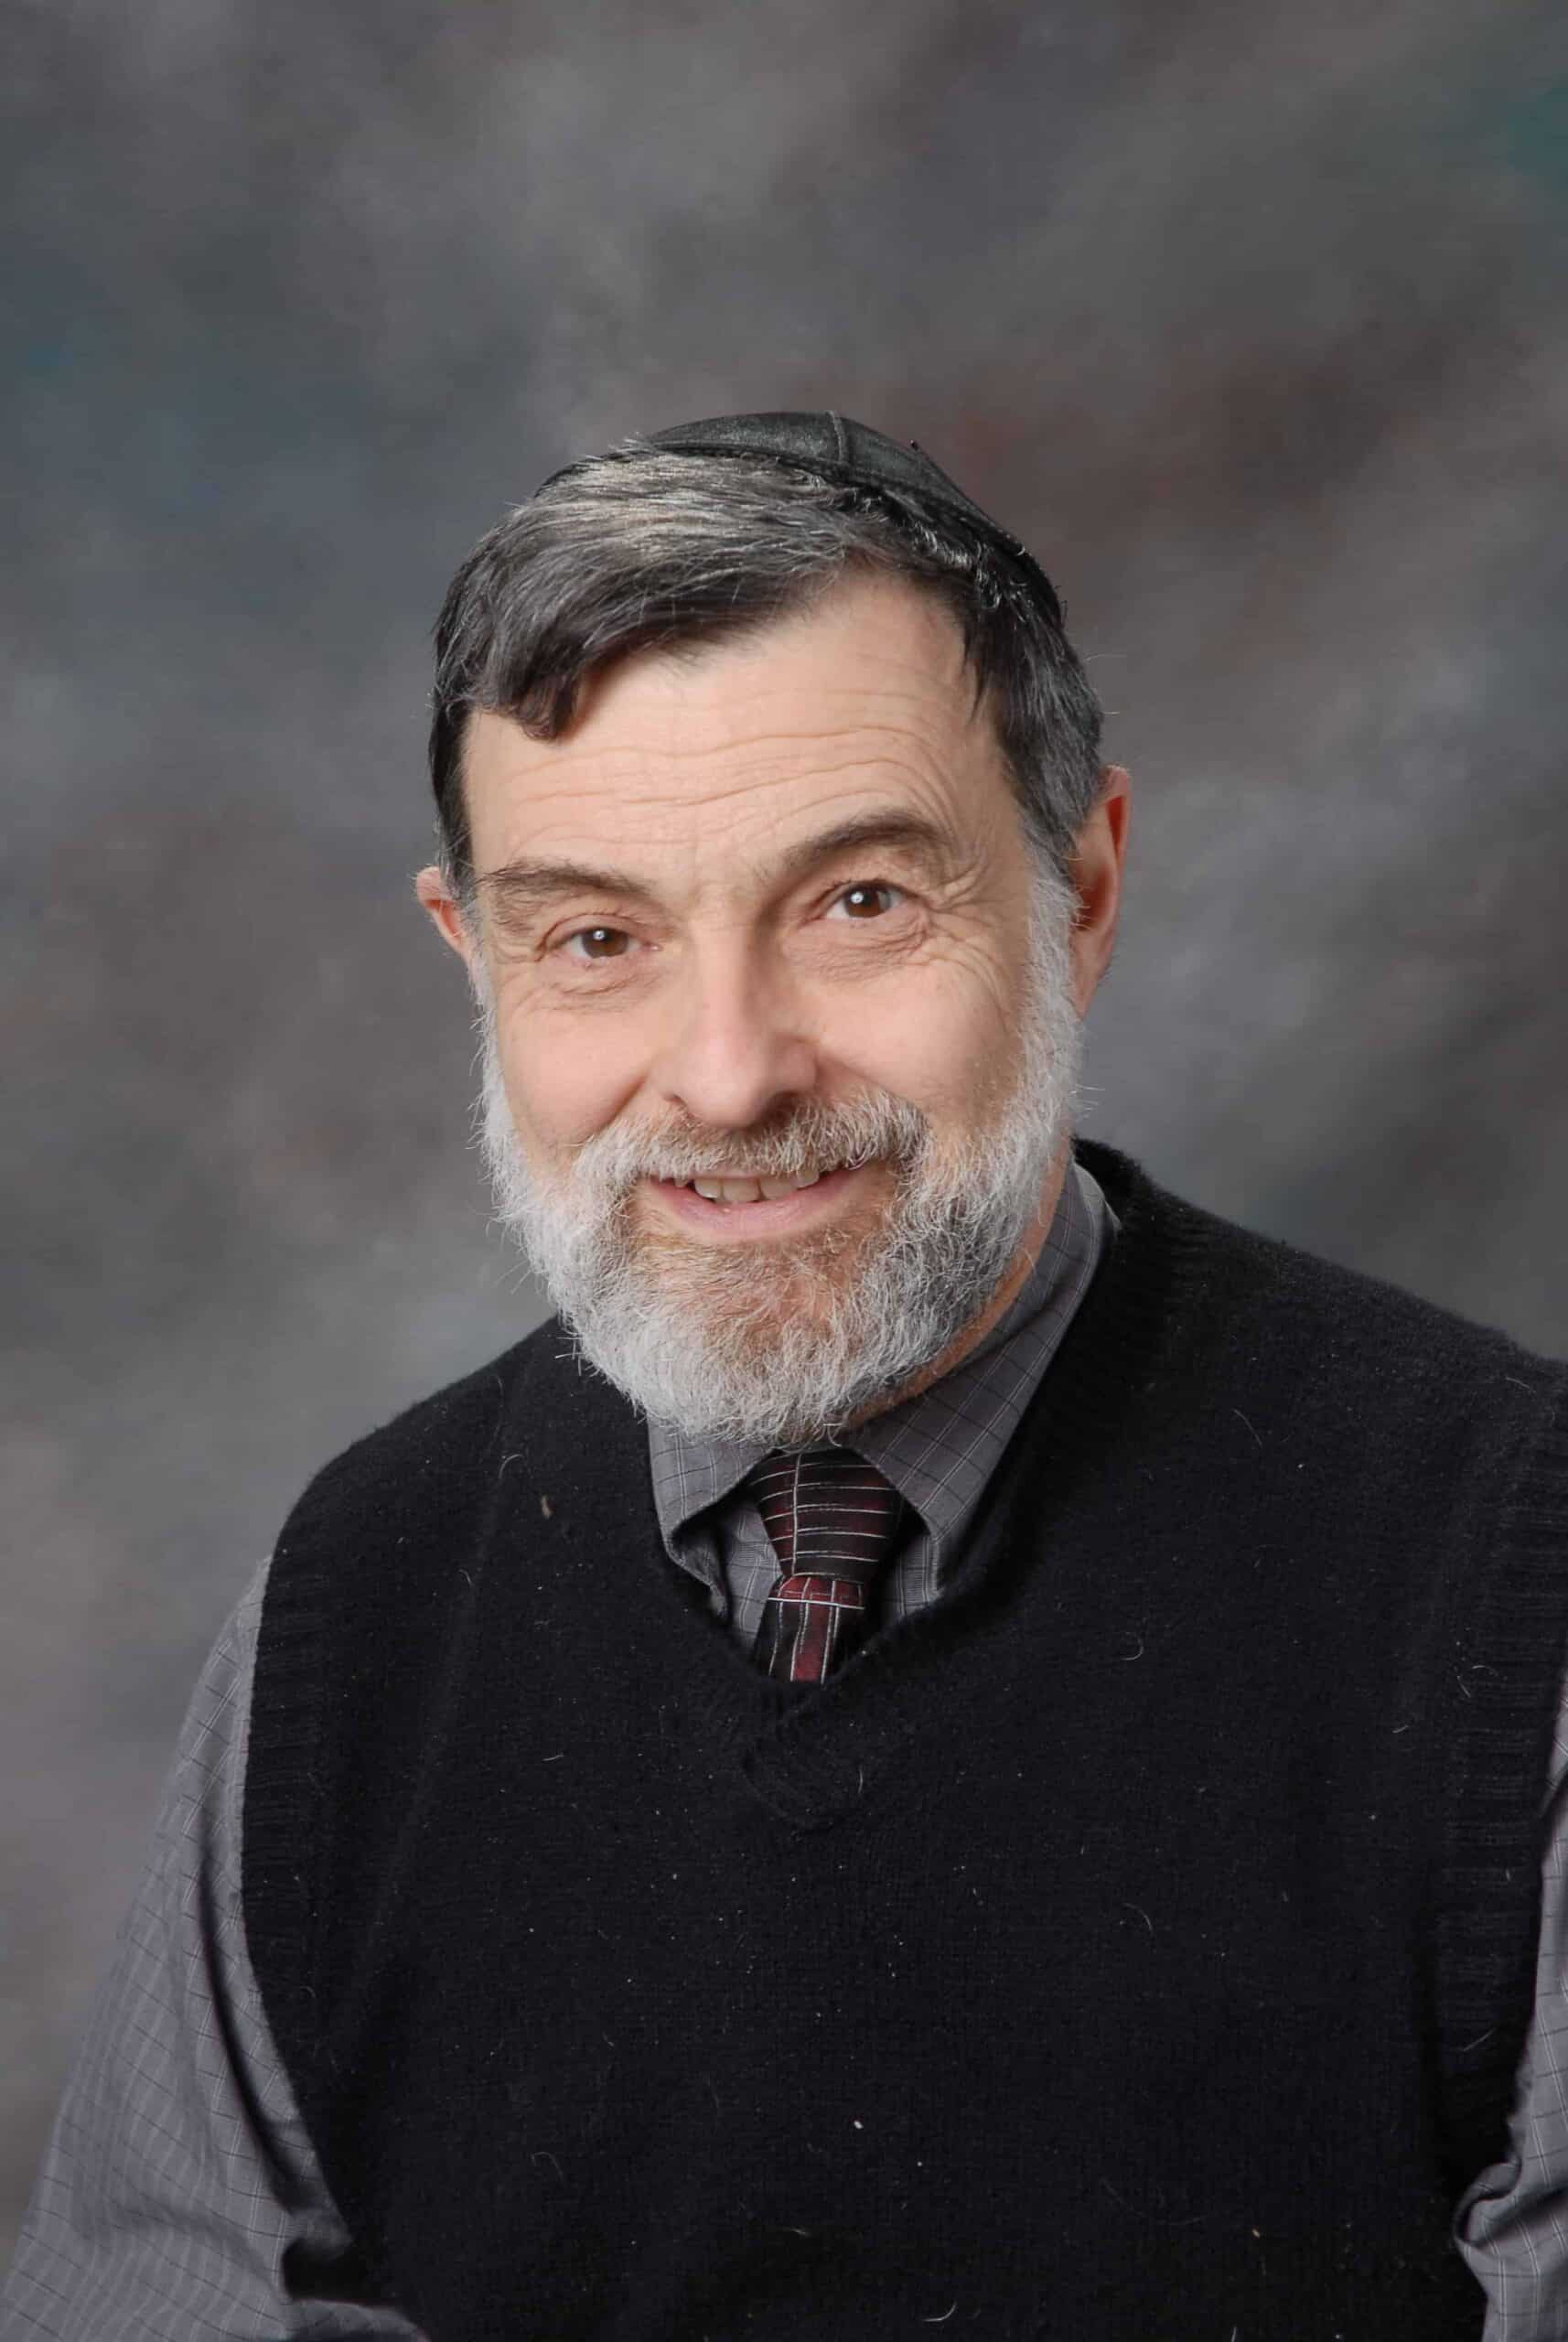 Dr. Robert Appleson